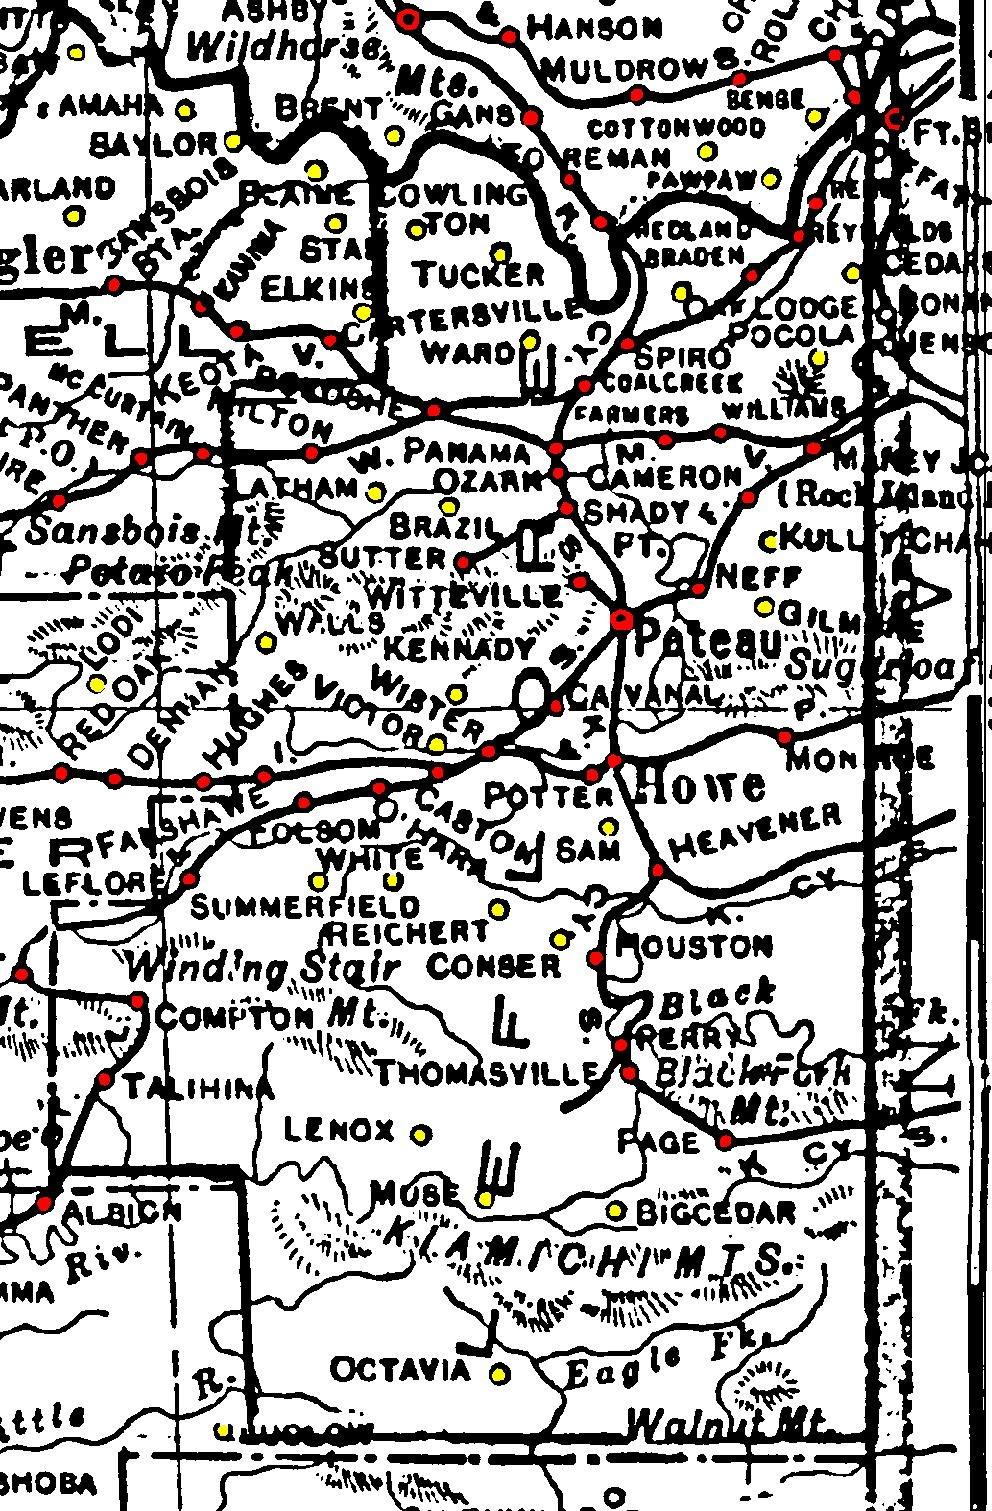 Leflore County Oklahoma Map.Leflore County Oklahoma Resources Maps